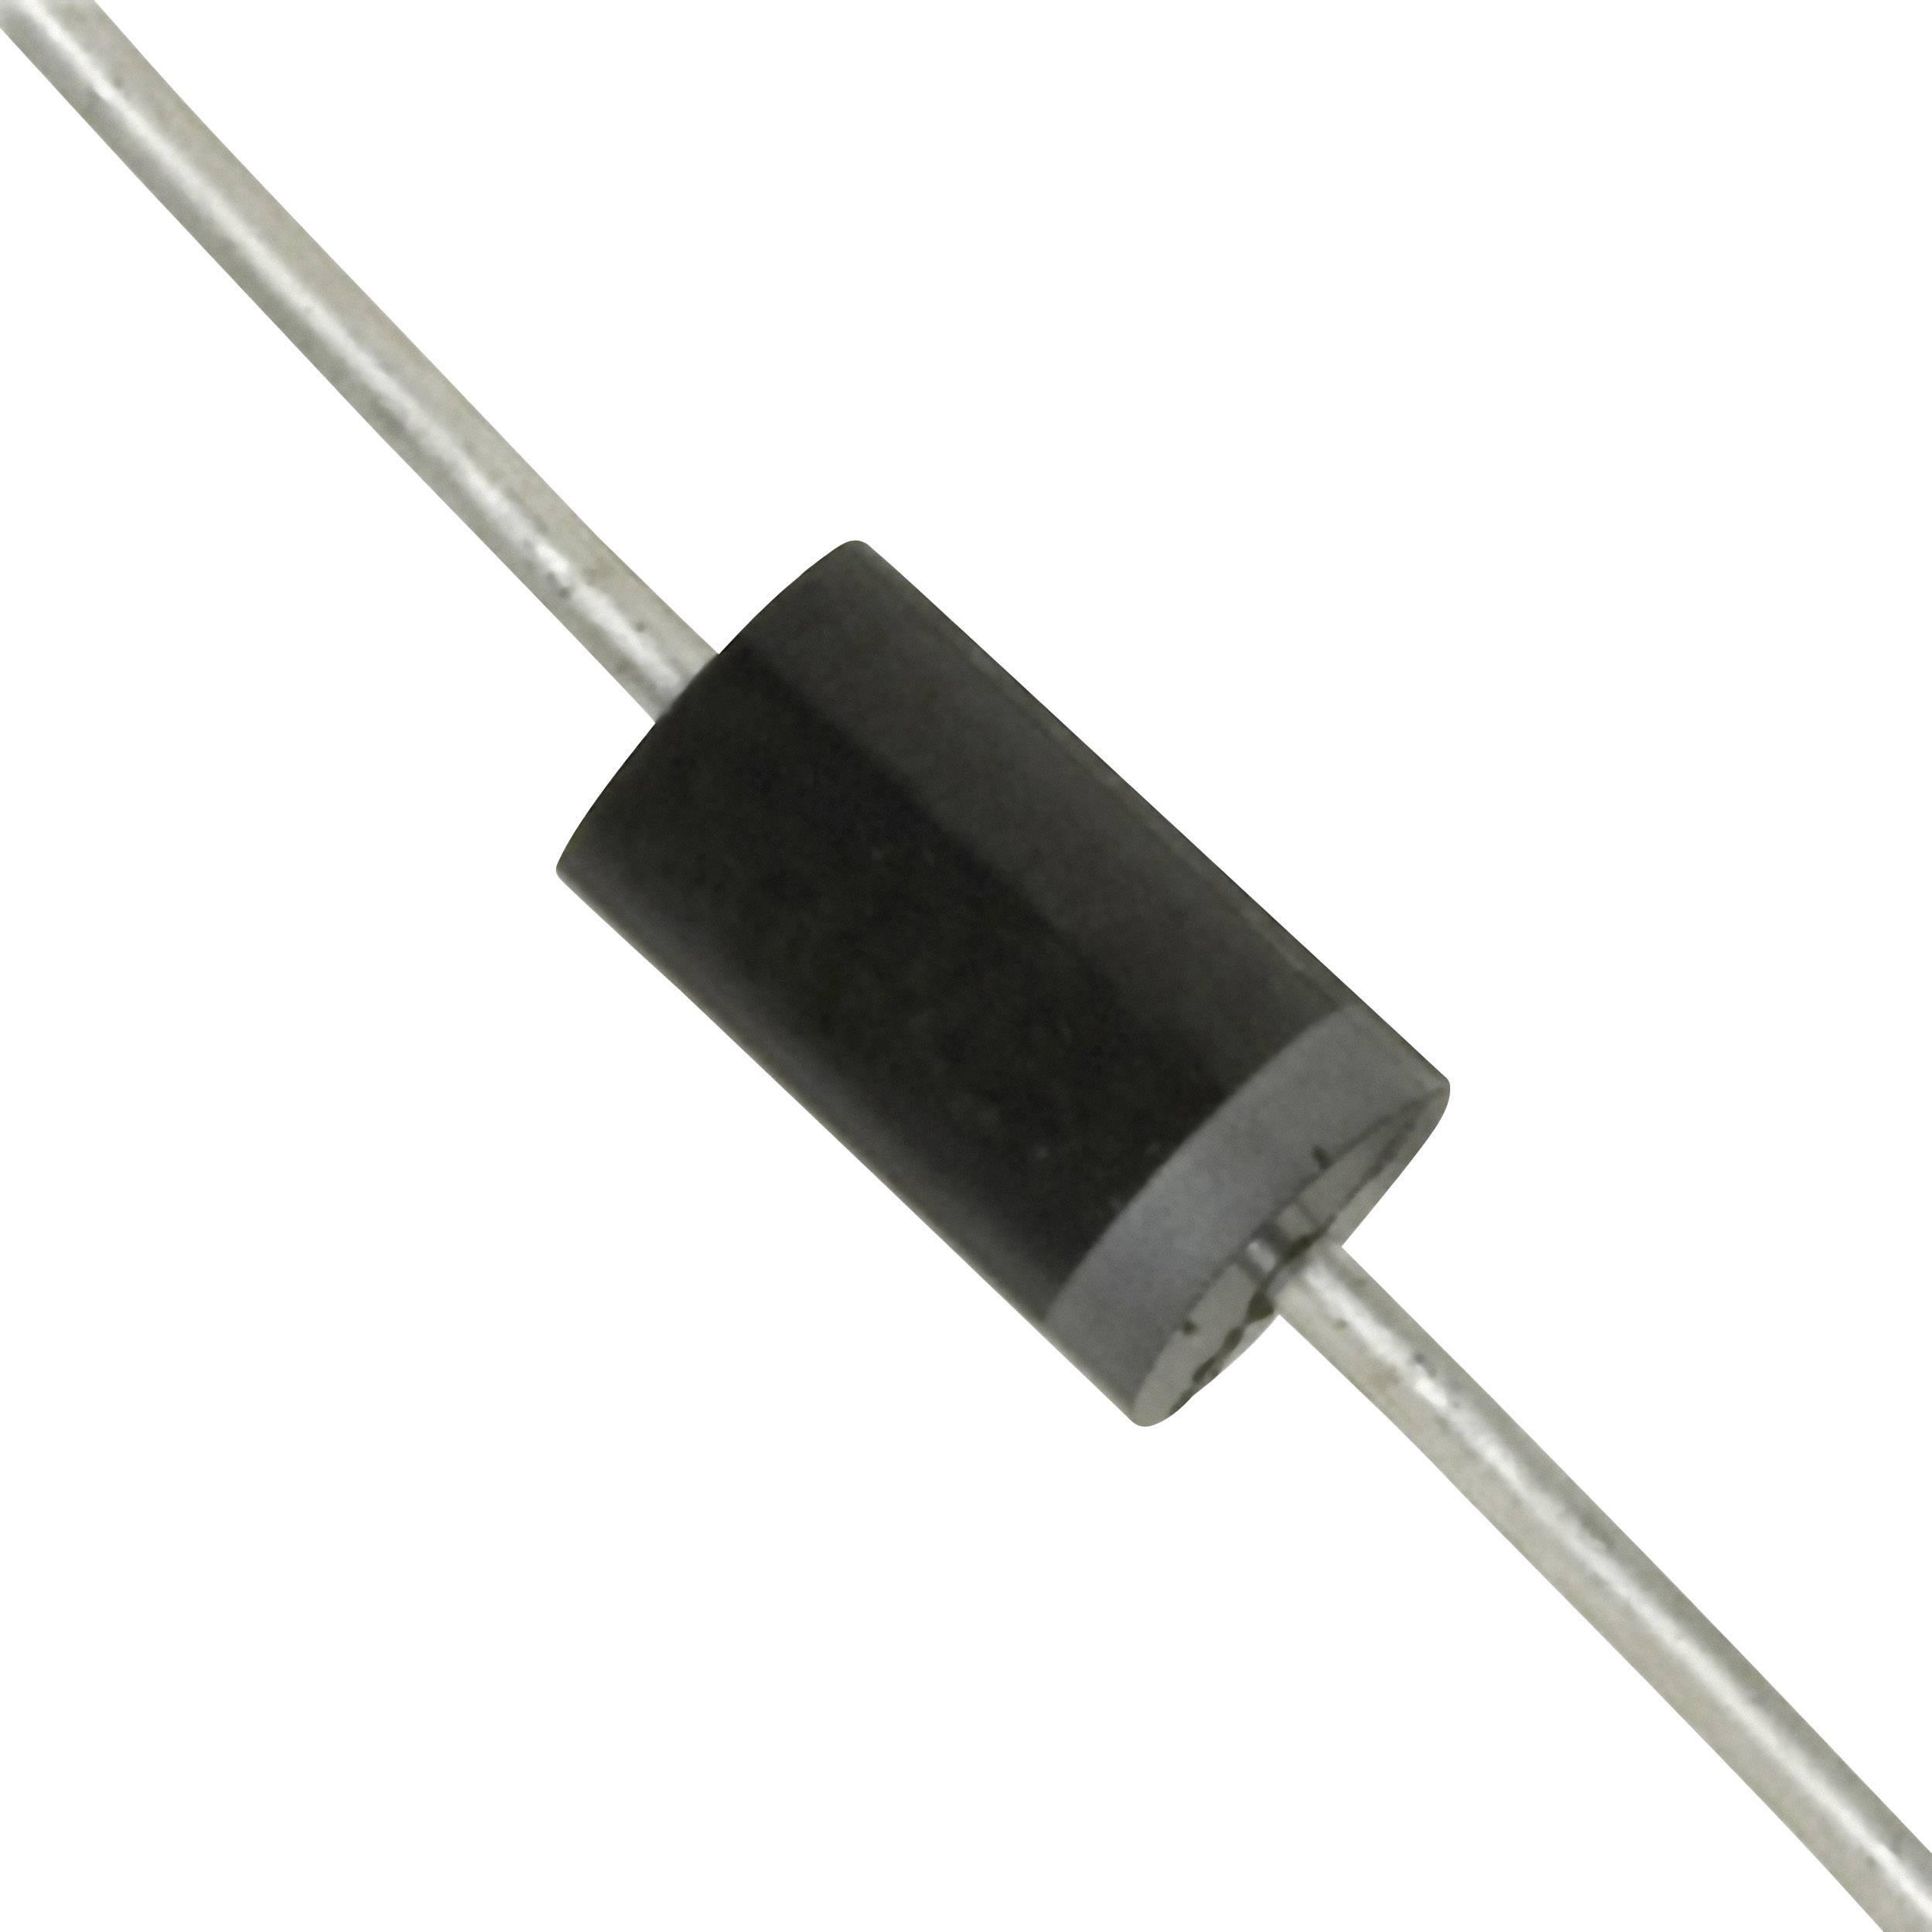 Transil STMicroelectronics 1500W 120V 1.5KE120A DO-201 STM